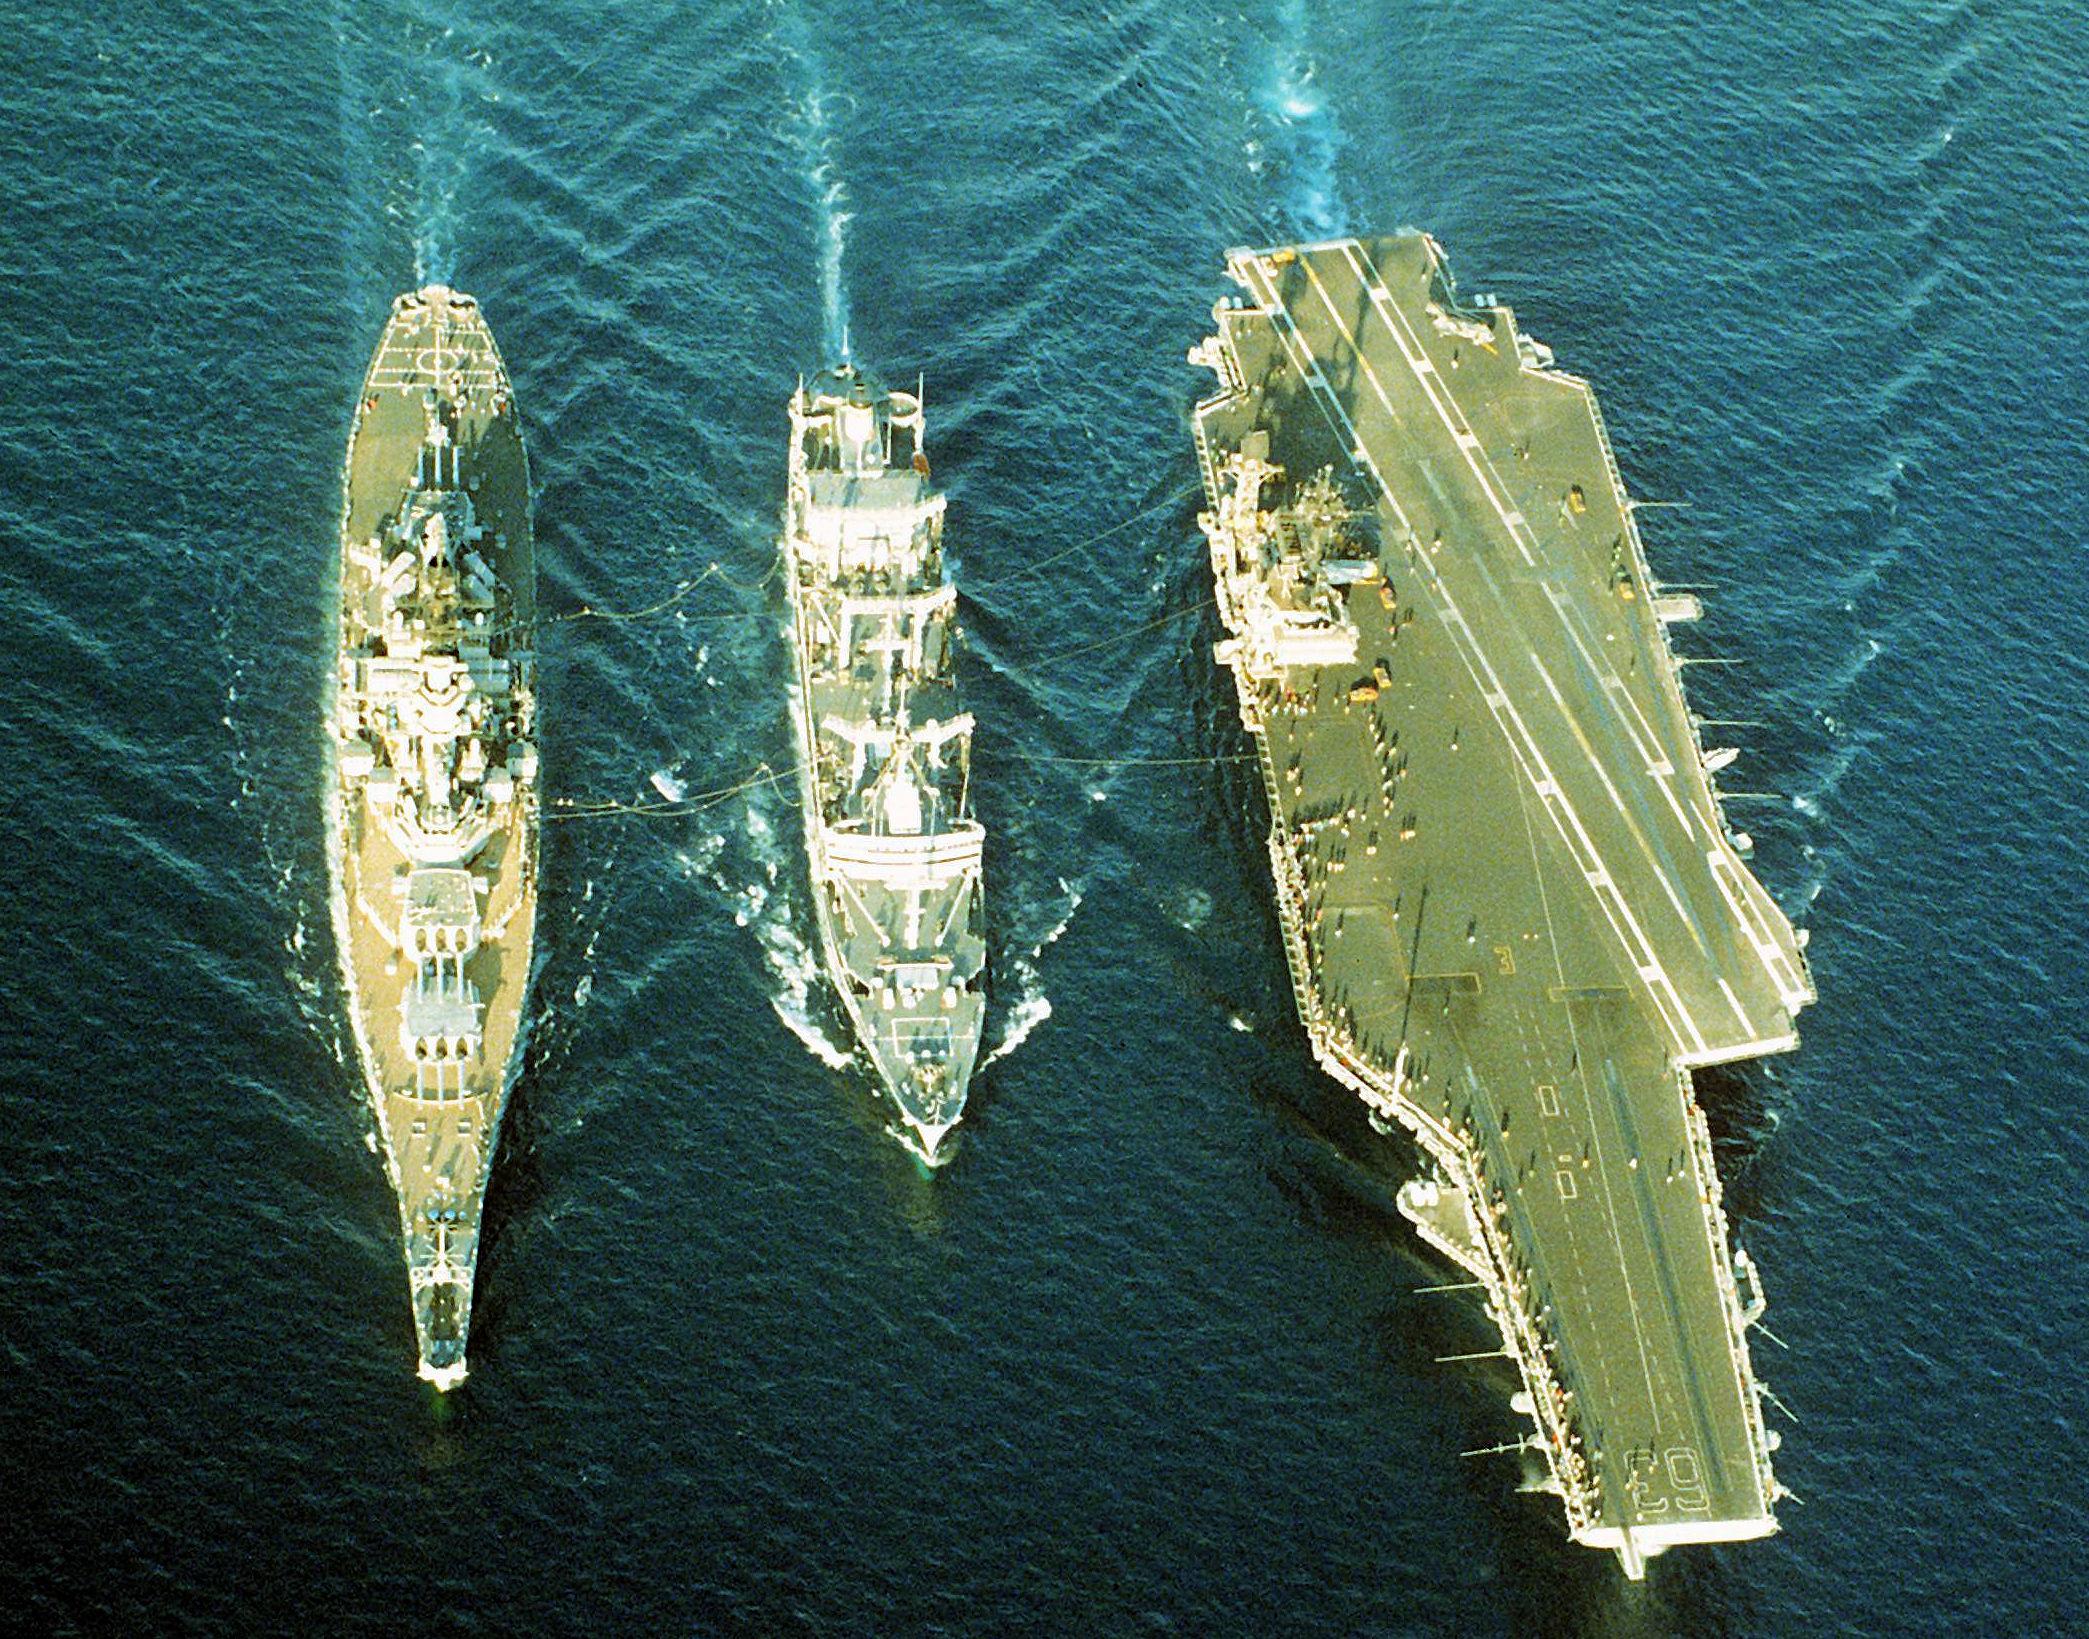 Pin Missouri Uss Battleship Hawaii Memorial Museum Navy Wallpaper With 2089x1639